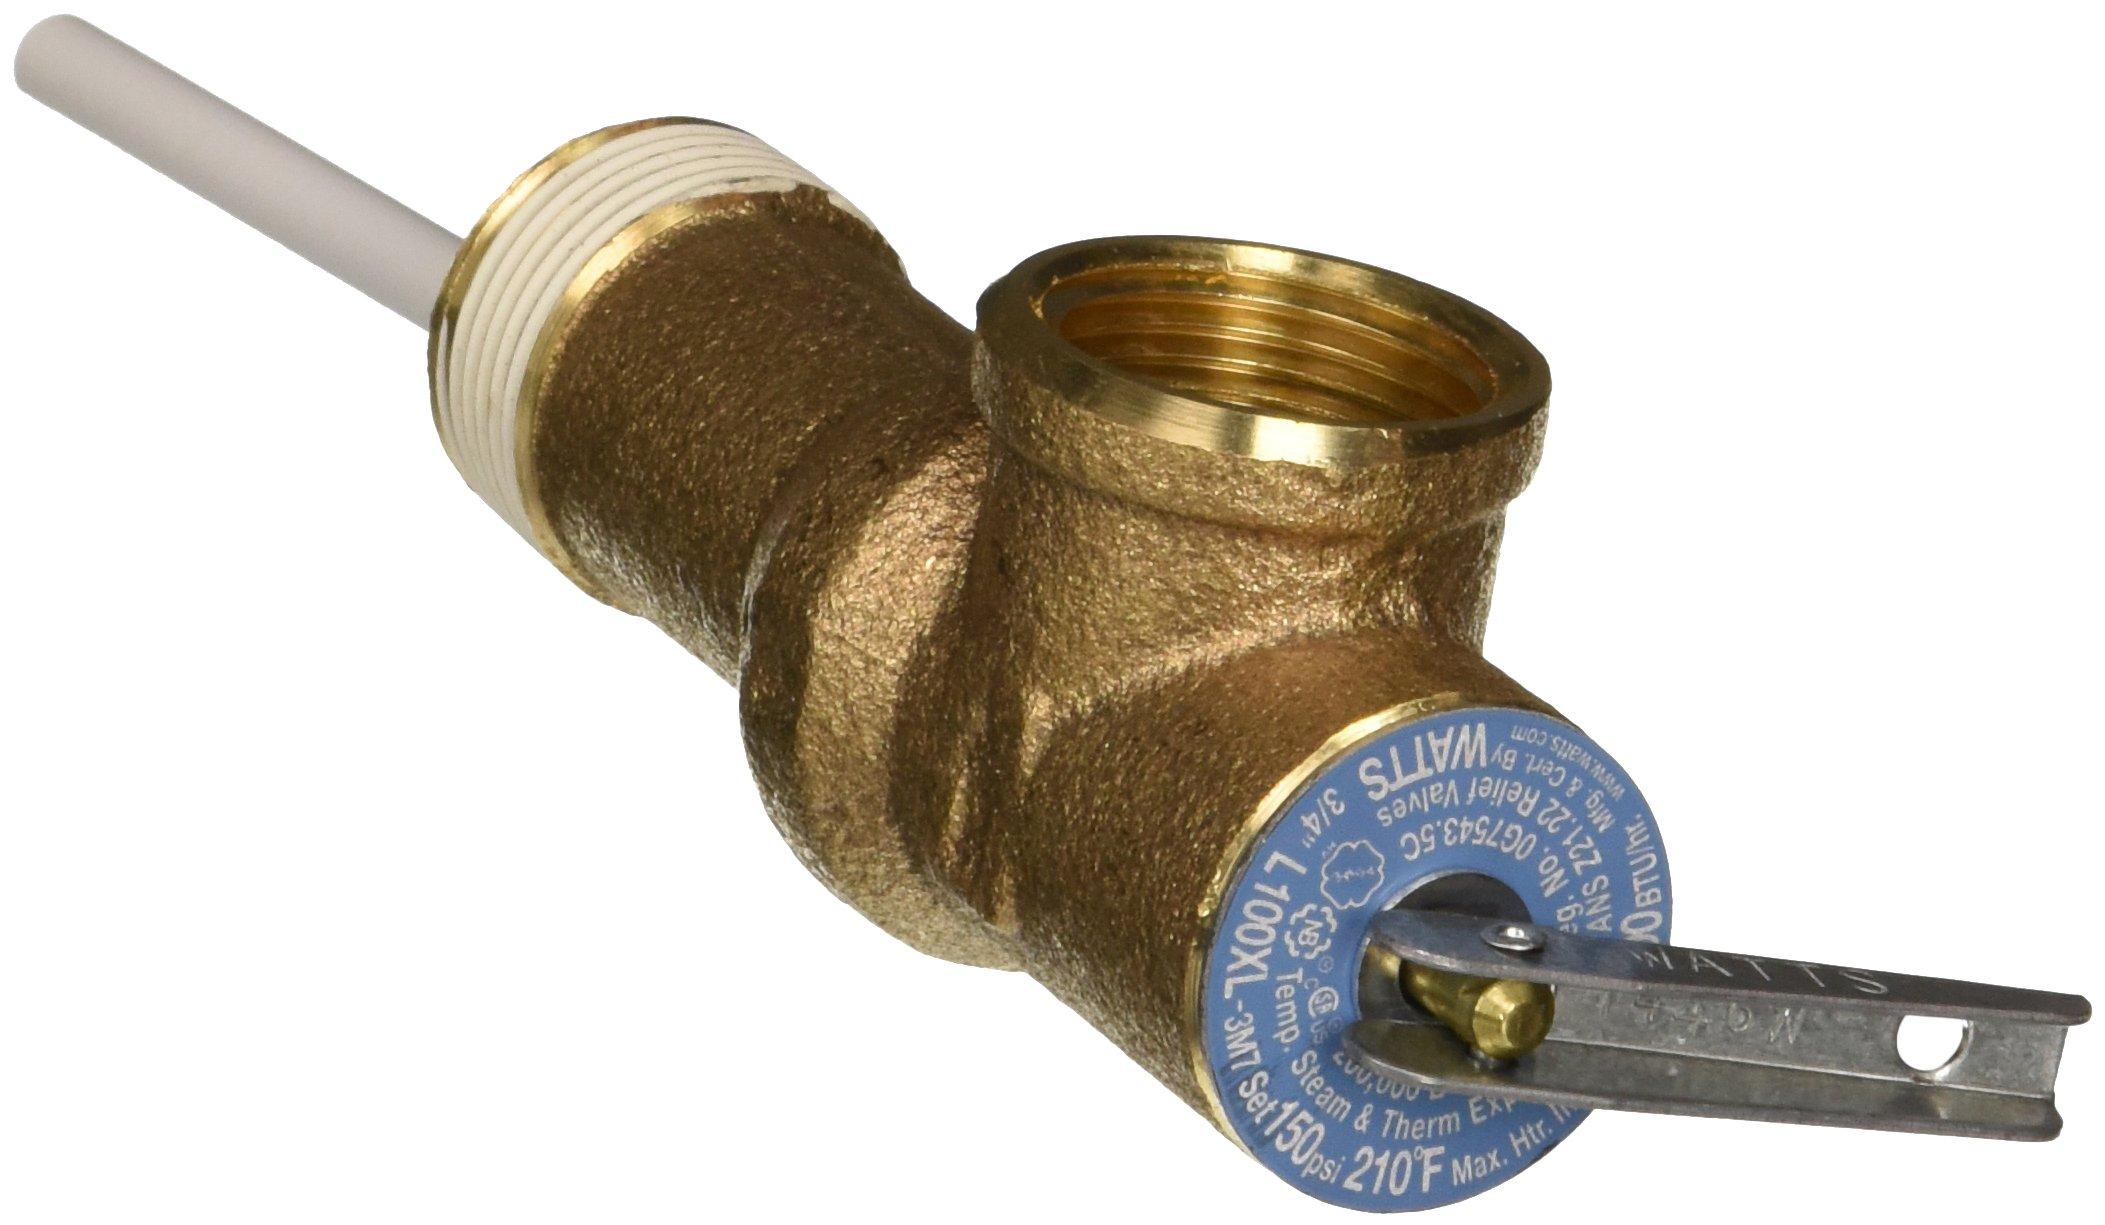 Rheem SP8346 Temperature and Pressure Relief Valve with 3/4-Inch NPT